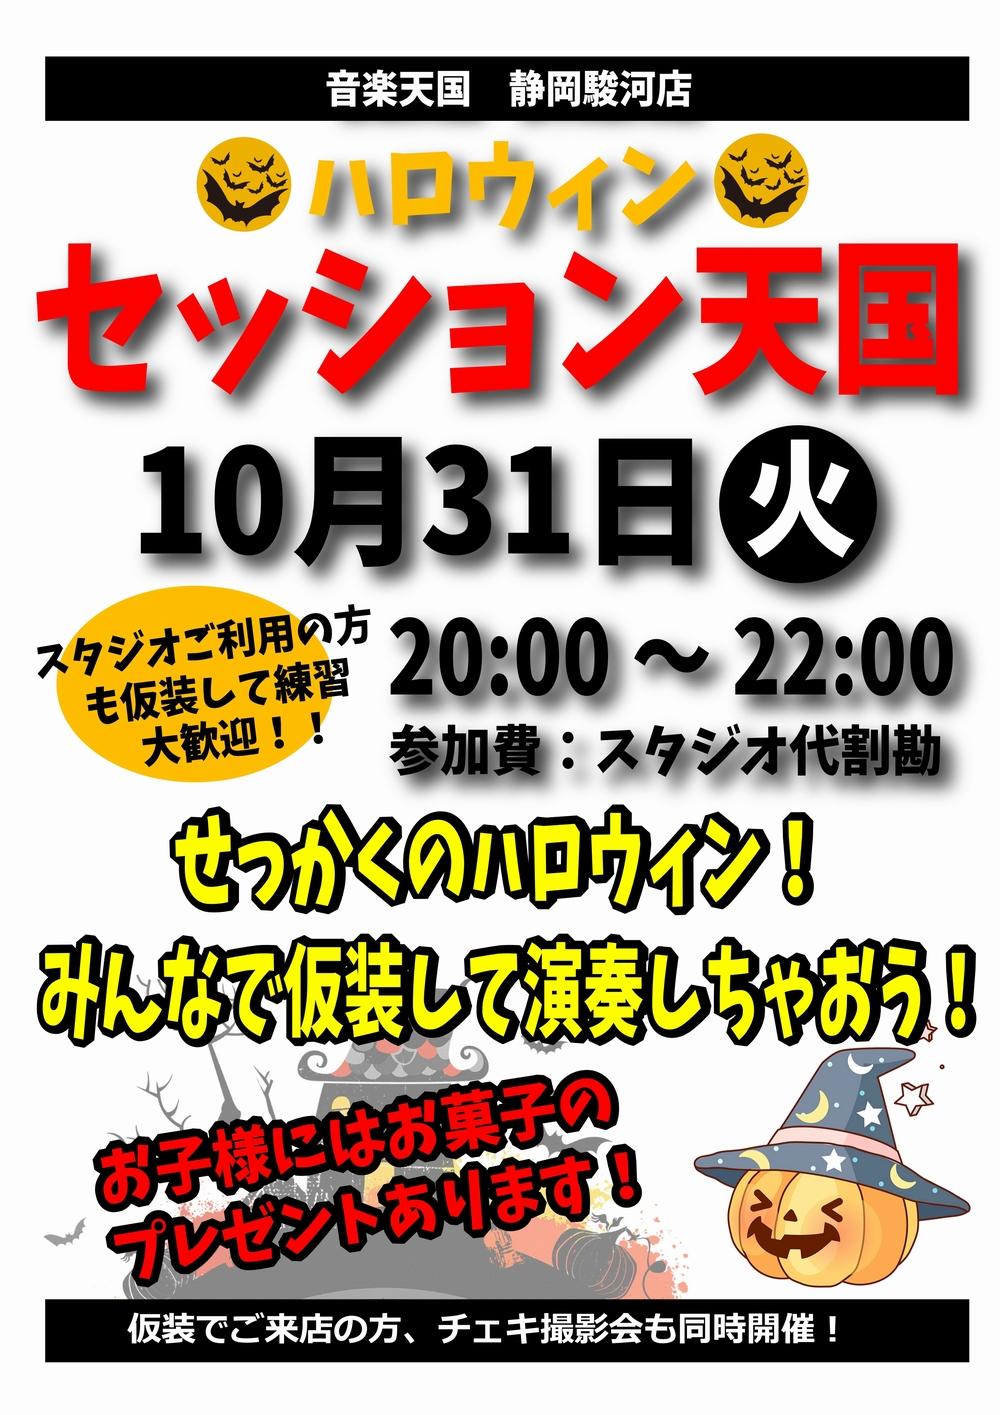 【セッション天国・ハロウィン】音楽天国・静岡駿河店10月31日(火)開催